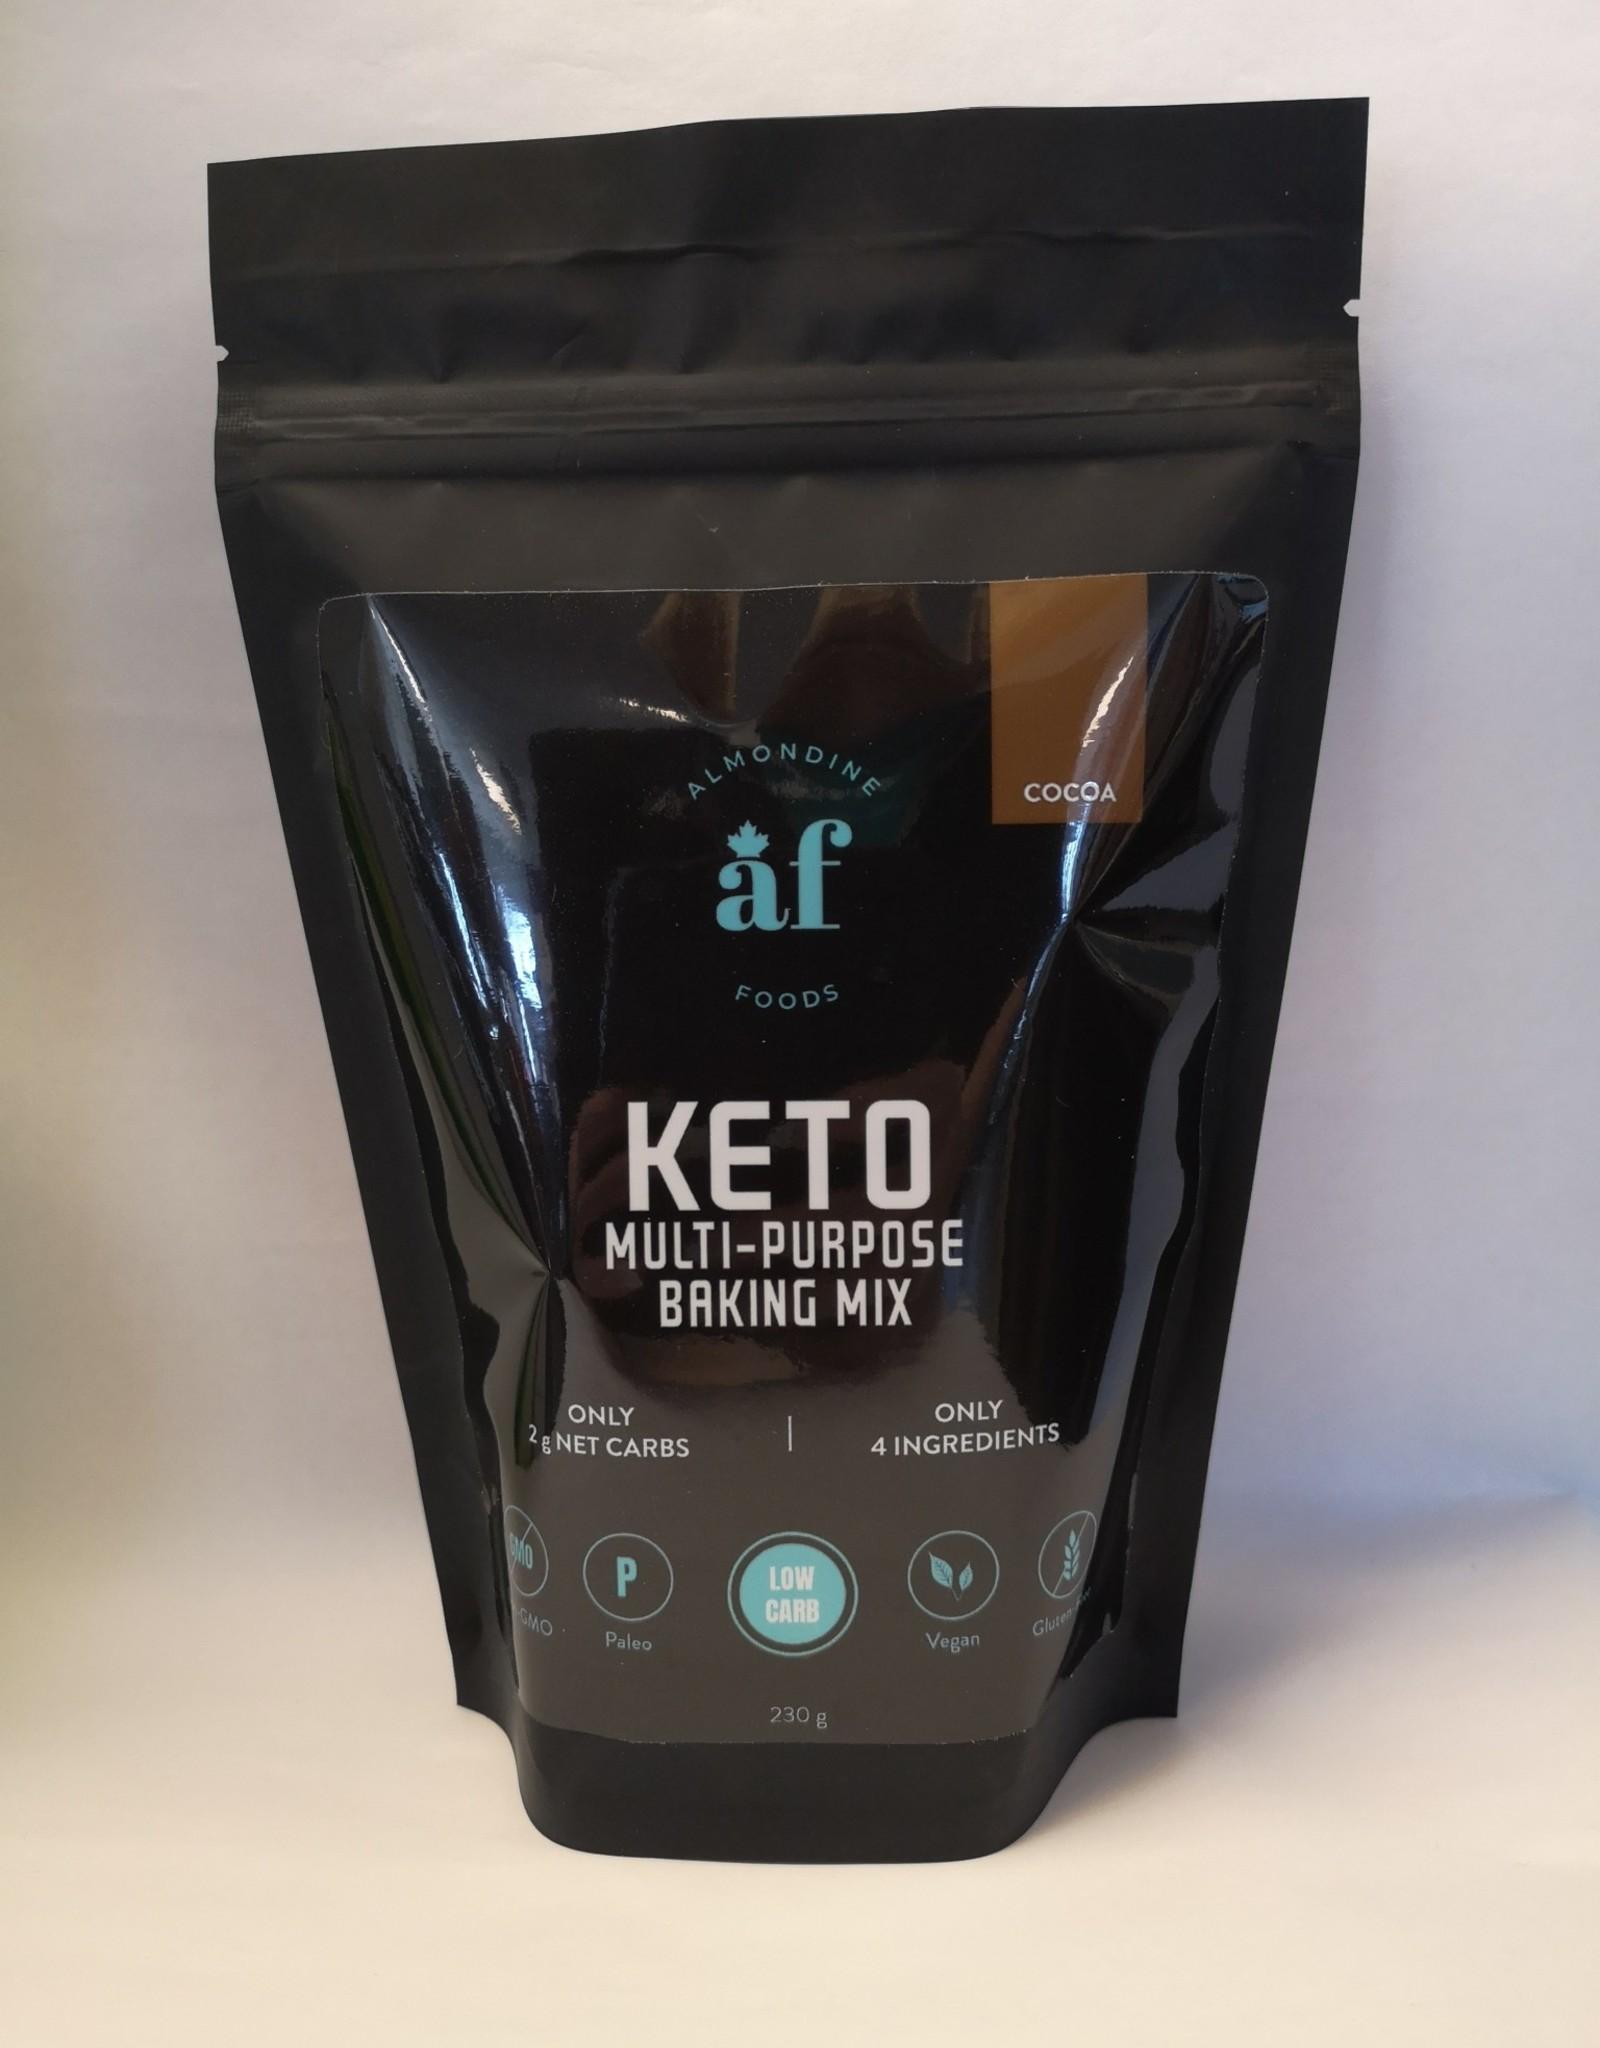 Almondine Foods - Cocoa Keto Baking Mix, (230g)